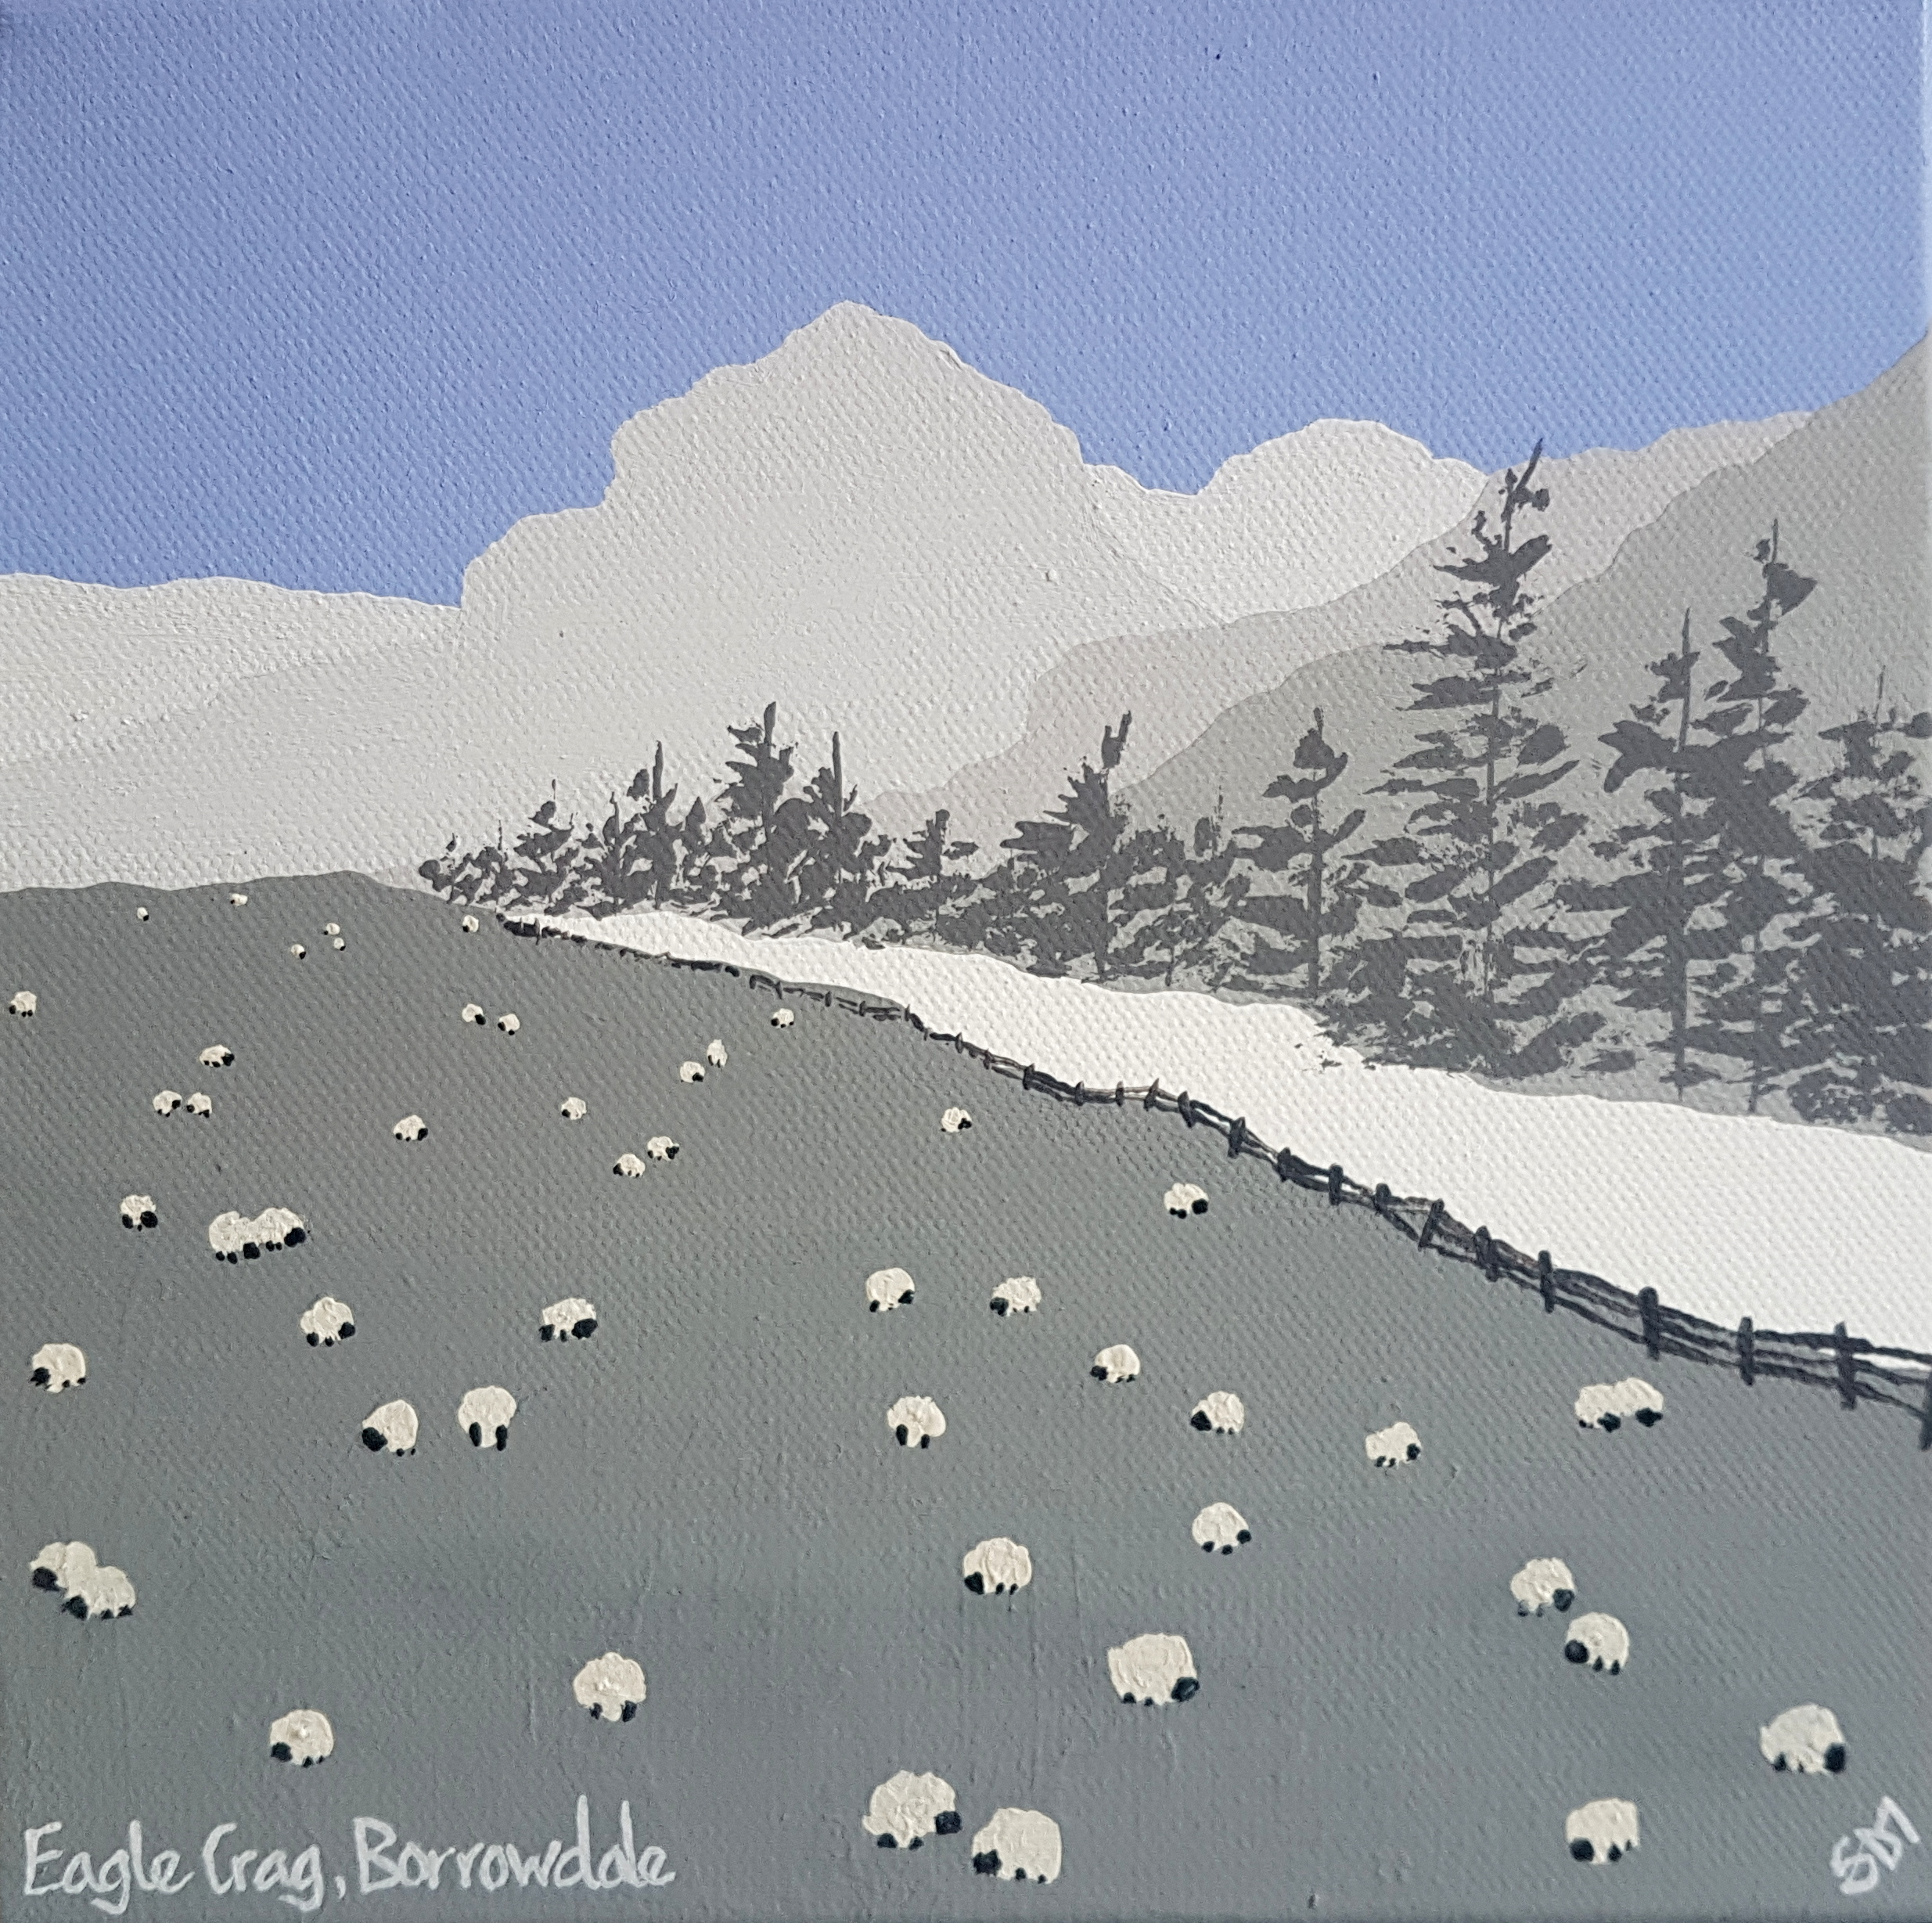 Eagle Crag Painting - Sam Martin, Artist.jpg